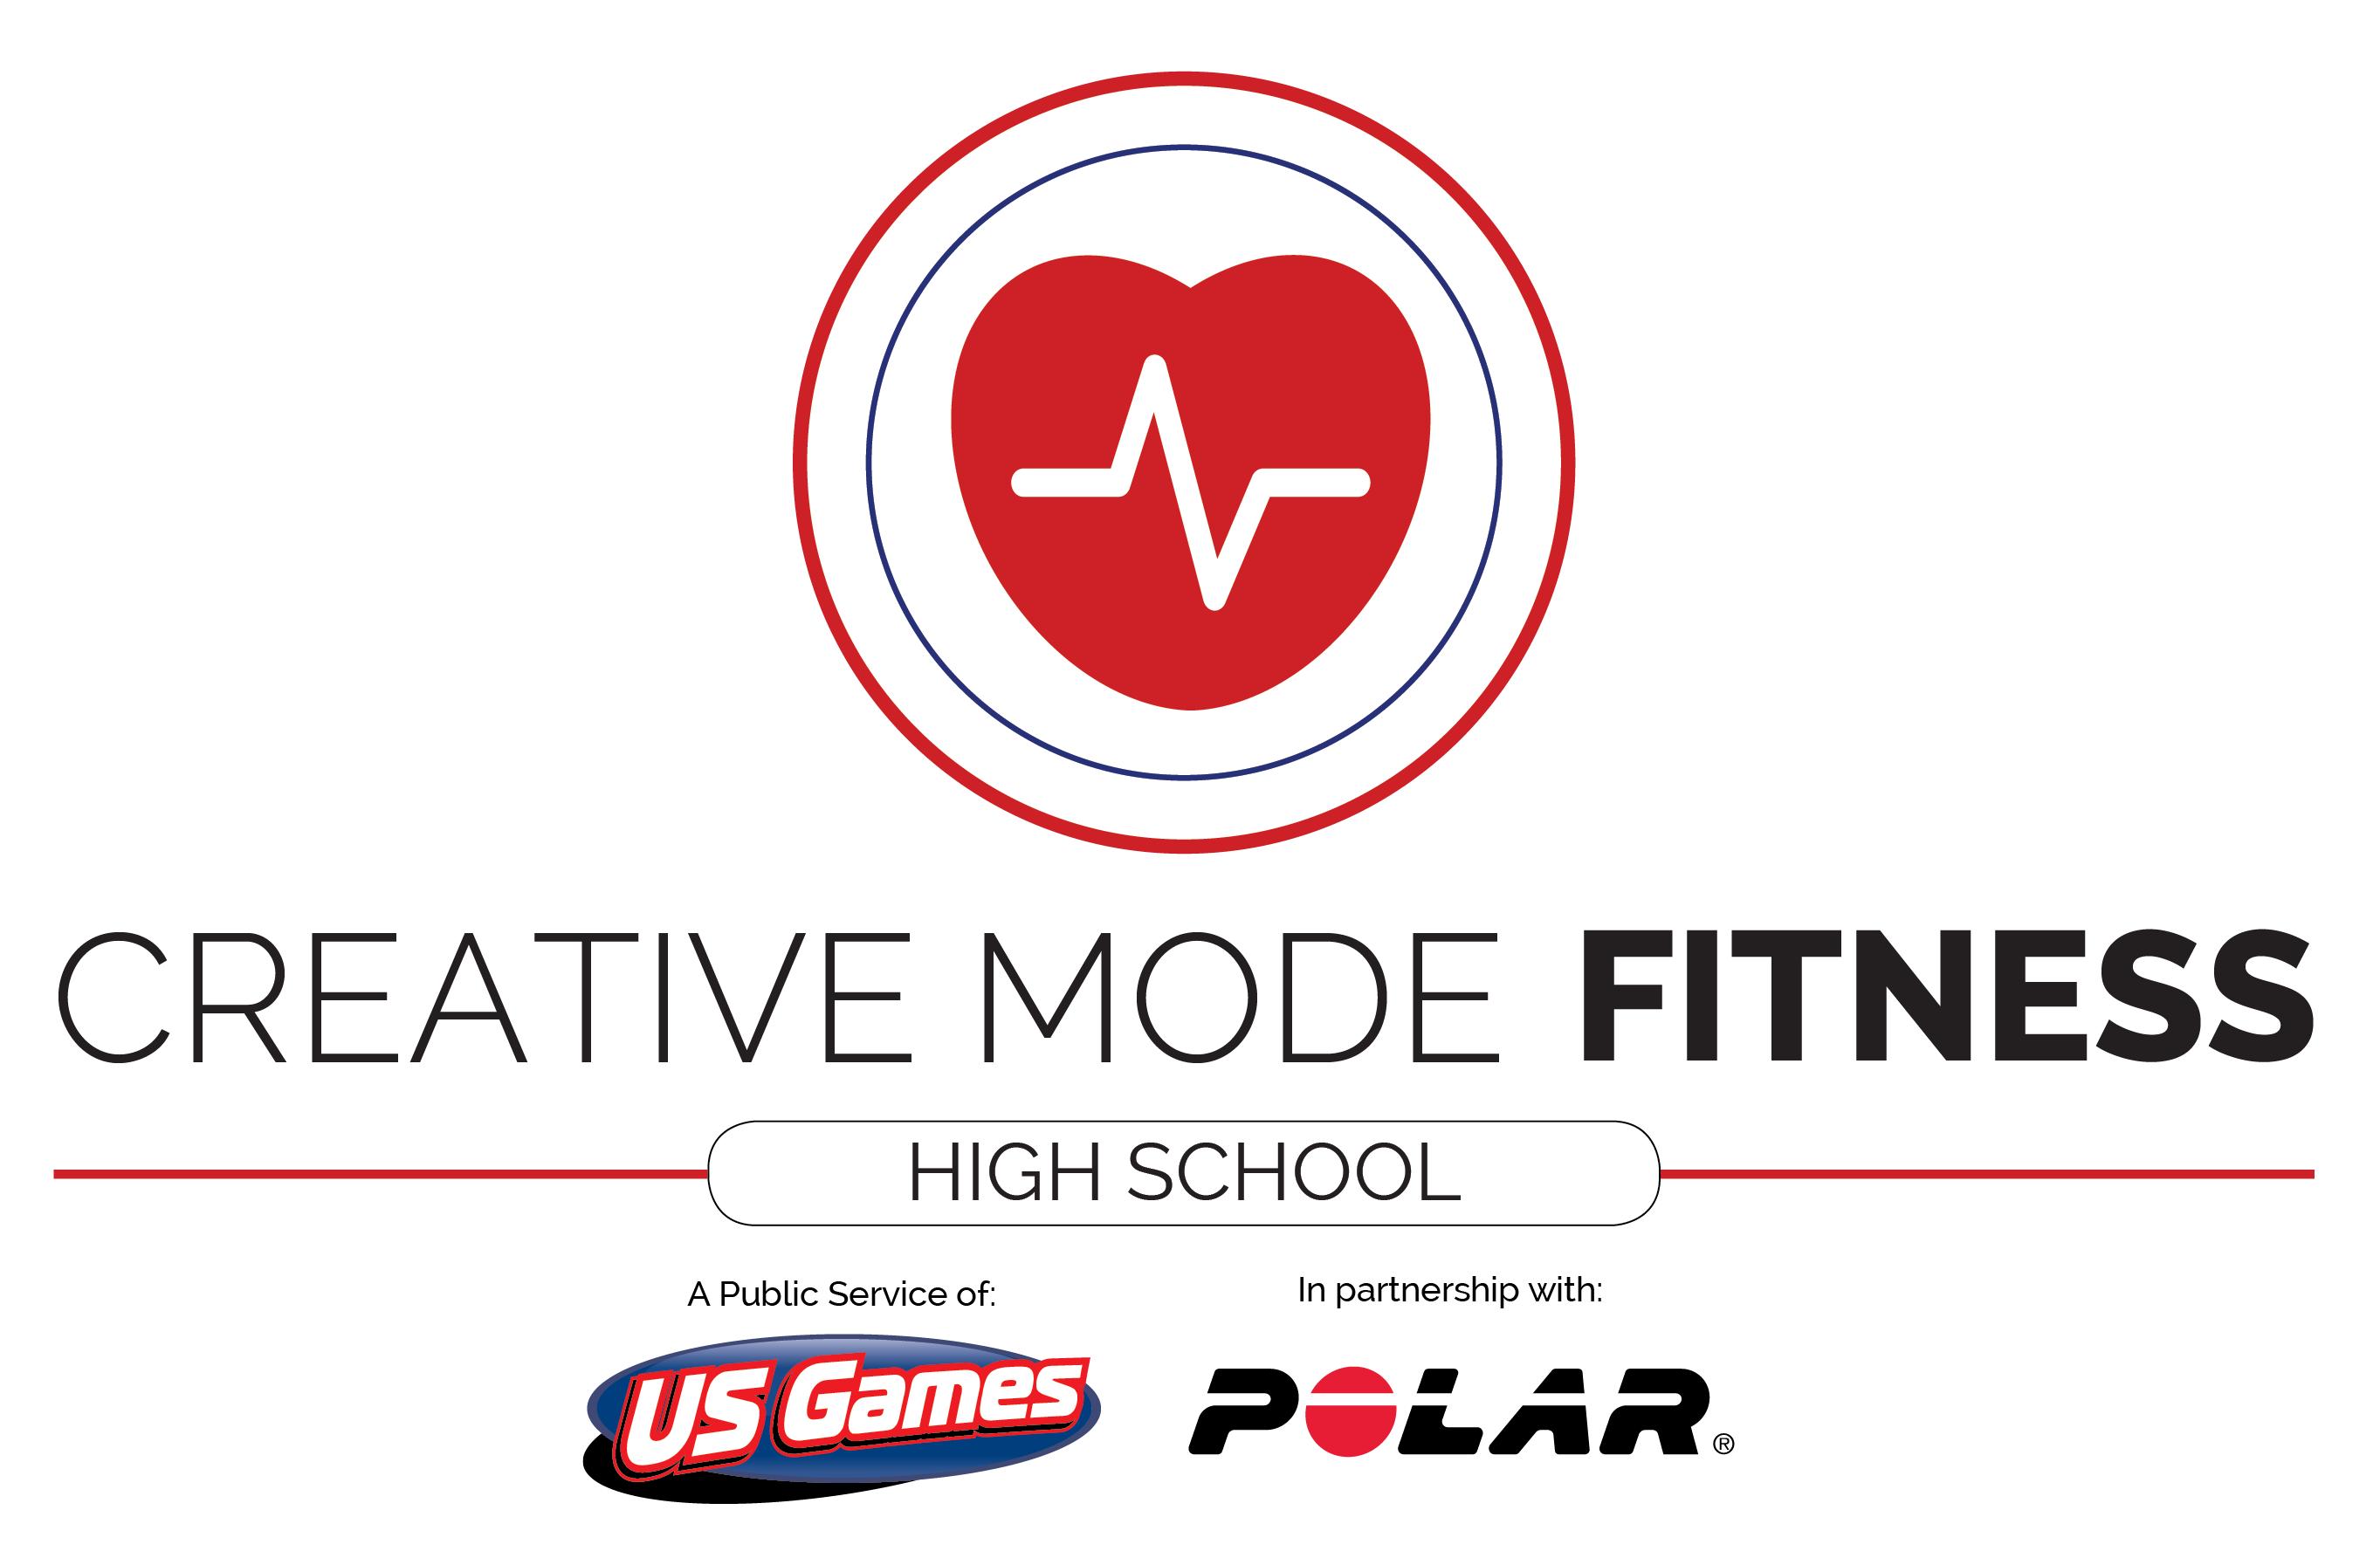 Creative Mode Fitness(High School)